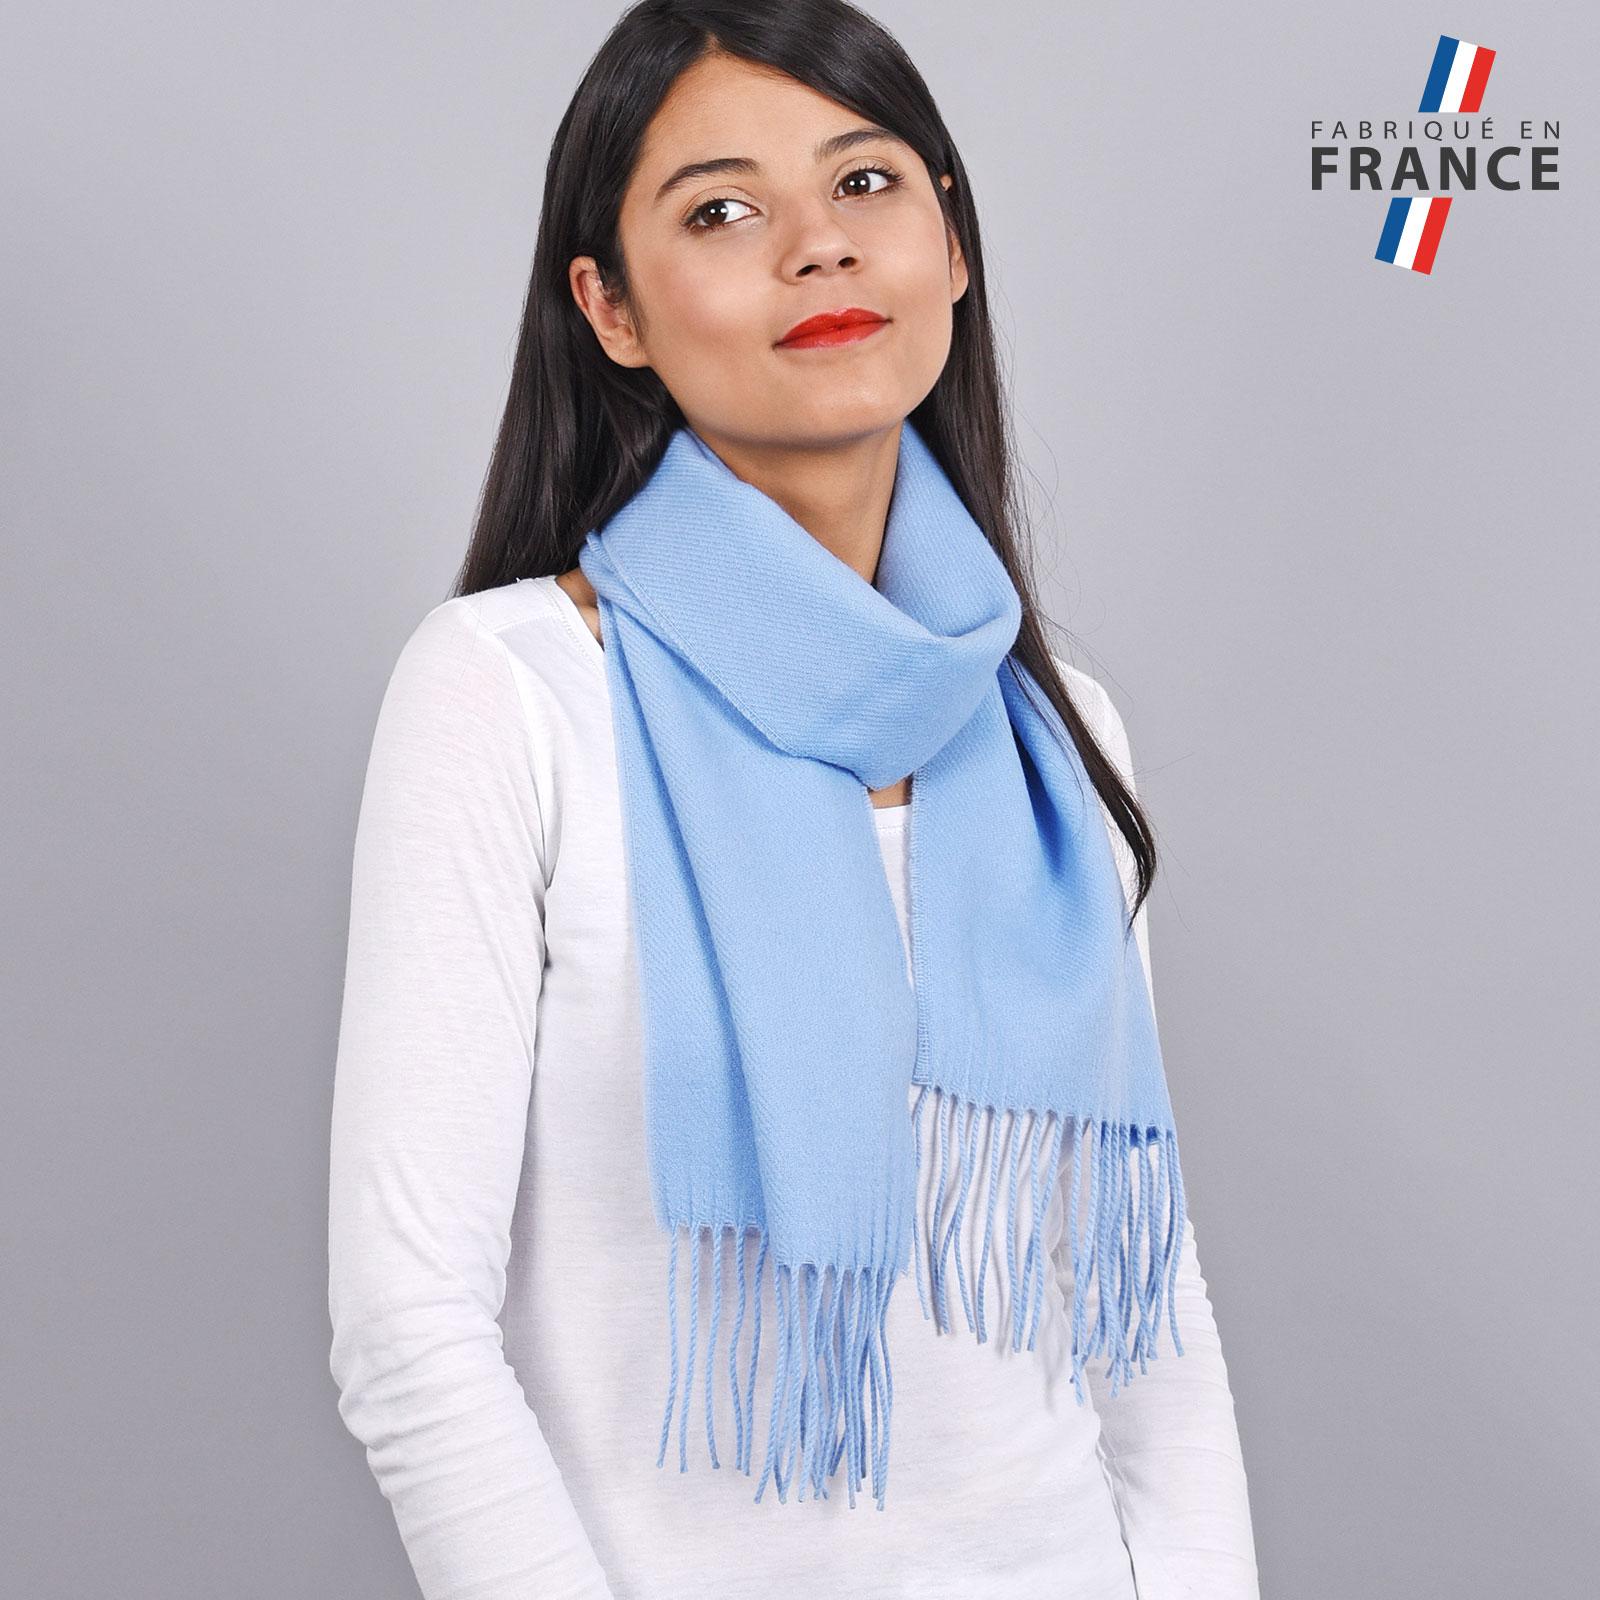 AT-03234-VF16-LB_FR-echarpe-a-franges-bleu-ciel-fabrication-francaise